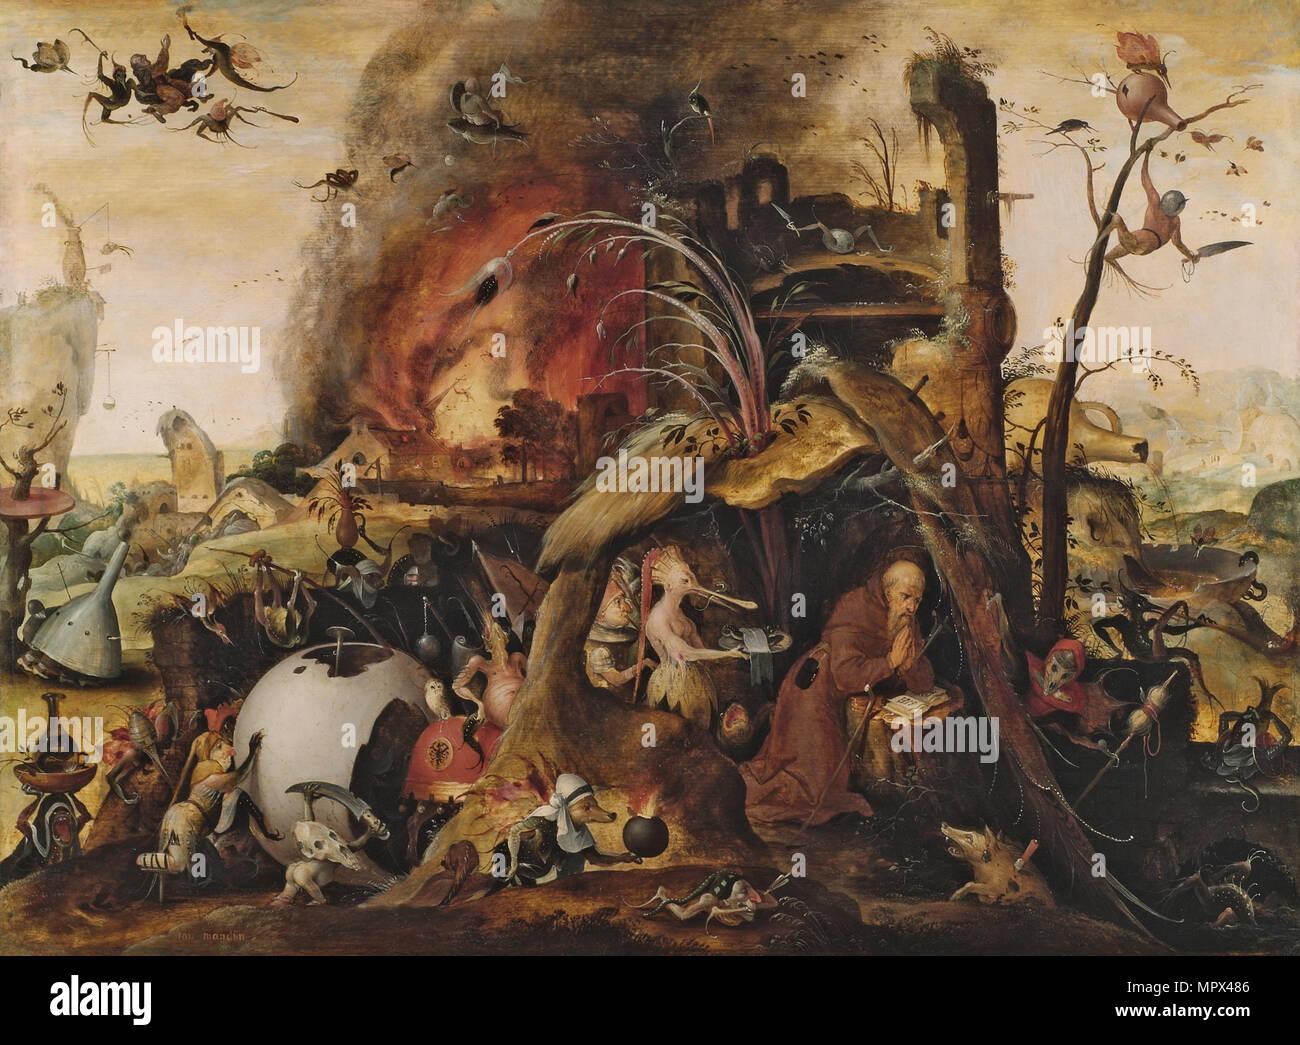 La Tentation de Saint Antoine, c. 1550. Photo Stock